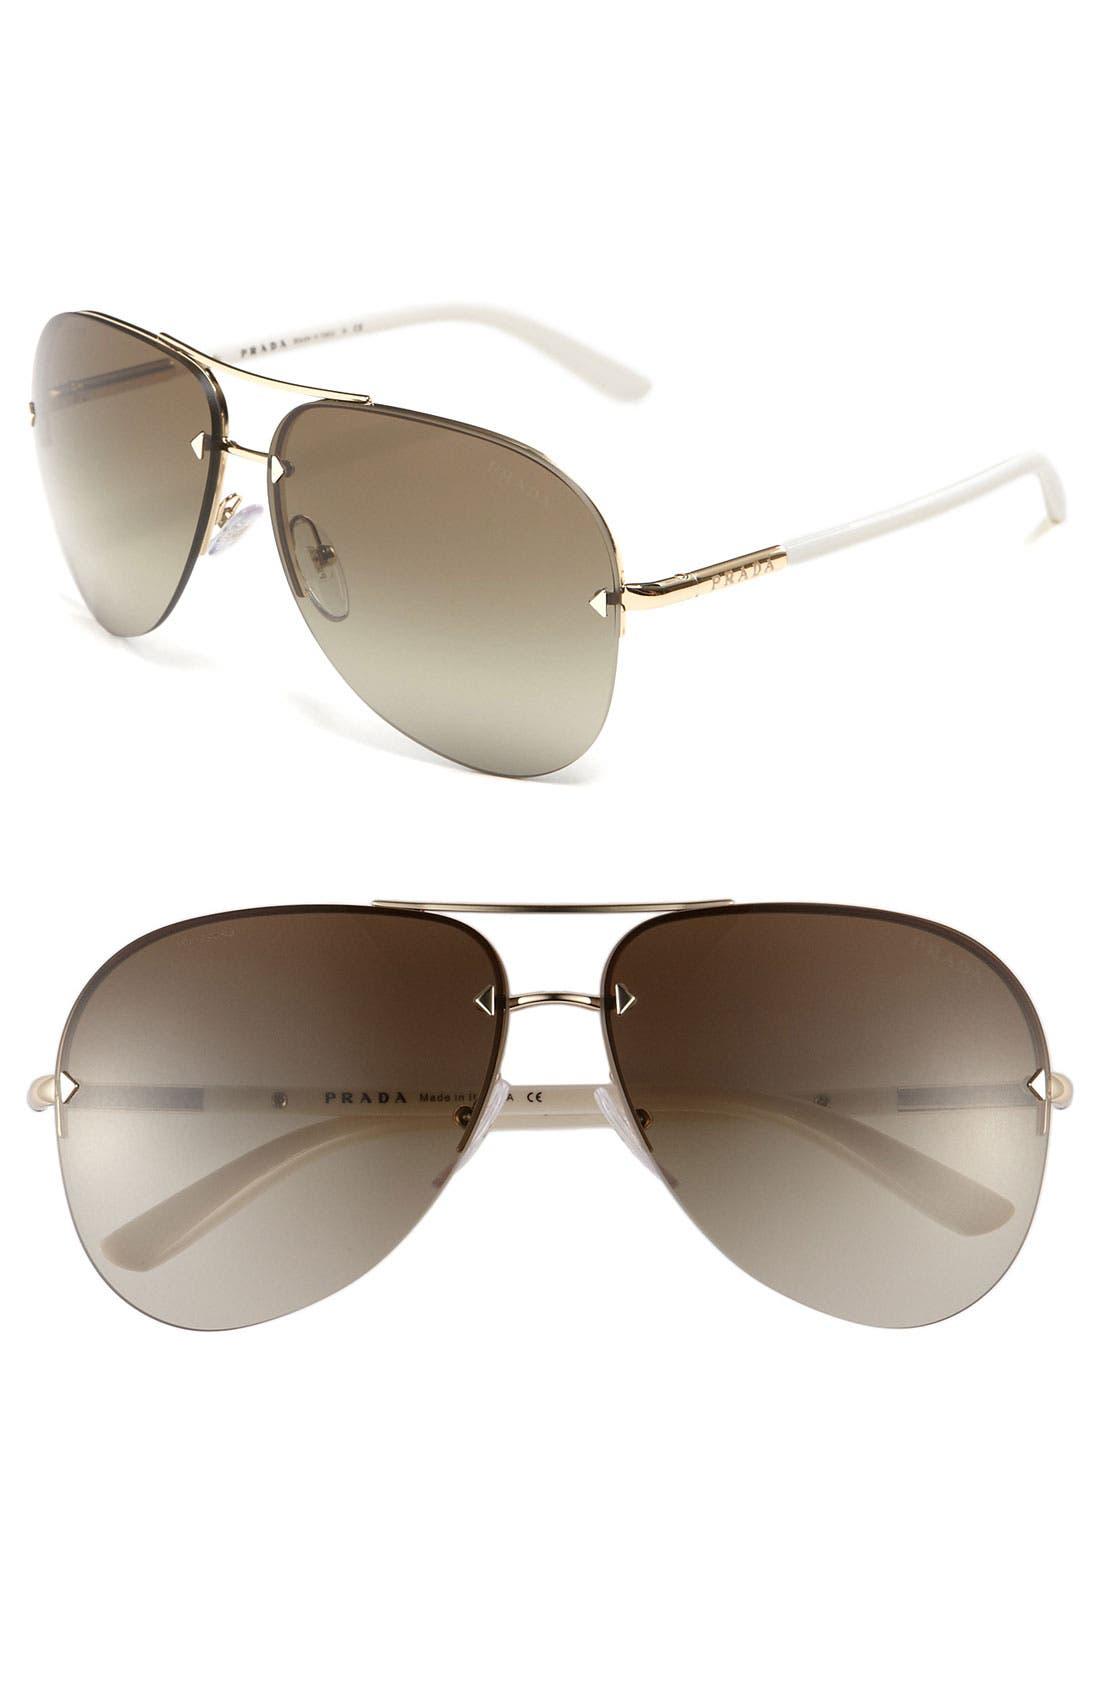 Main Image - Prada 61mm Aviator Sunglasses